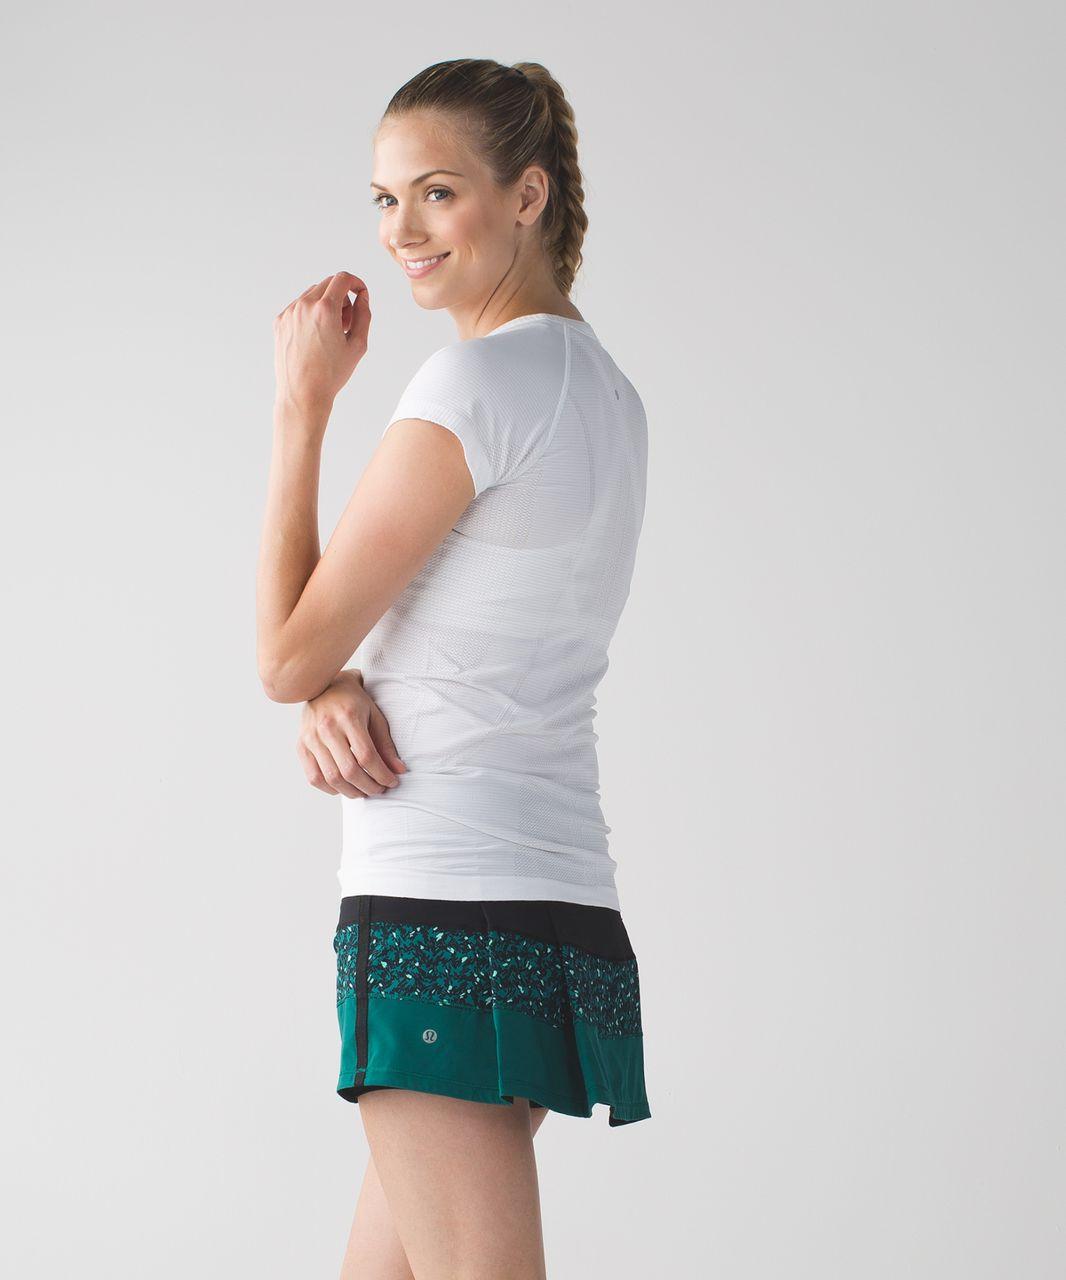 Lululemon Pace Rival Skirt II (Regular) *4-way Stretch - Black / Mountain Peaks Black Forage Teal / Forage Teal